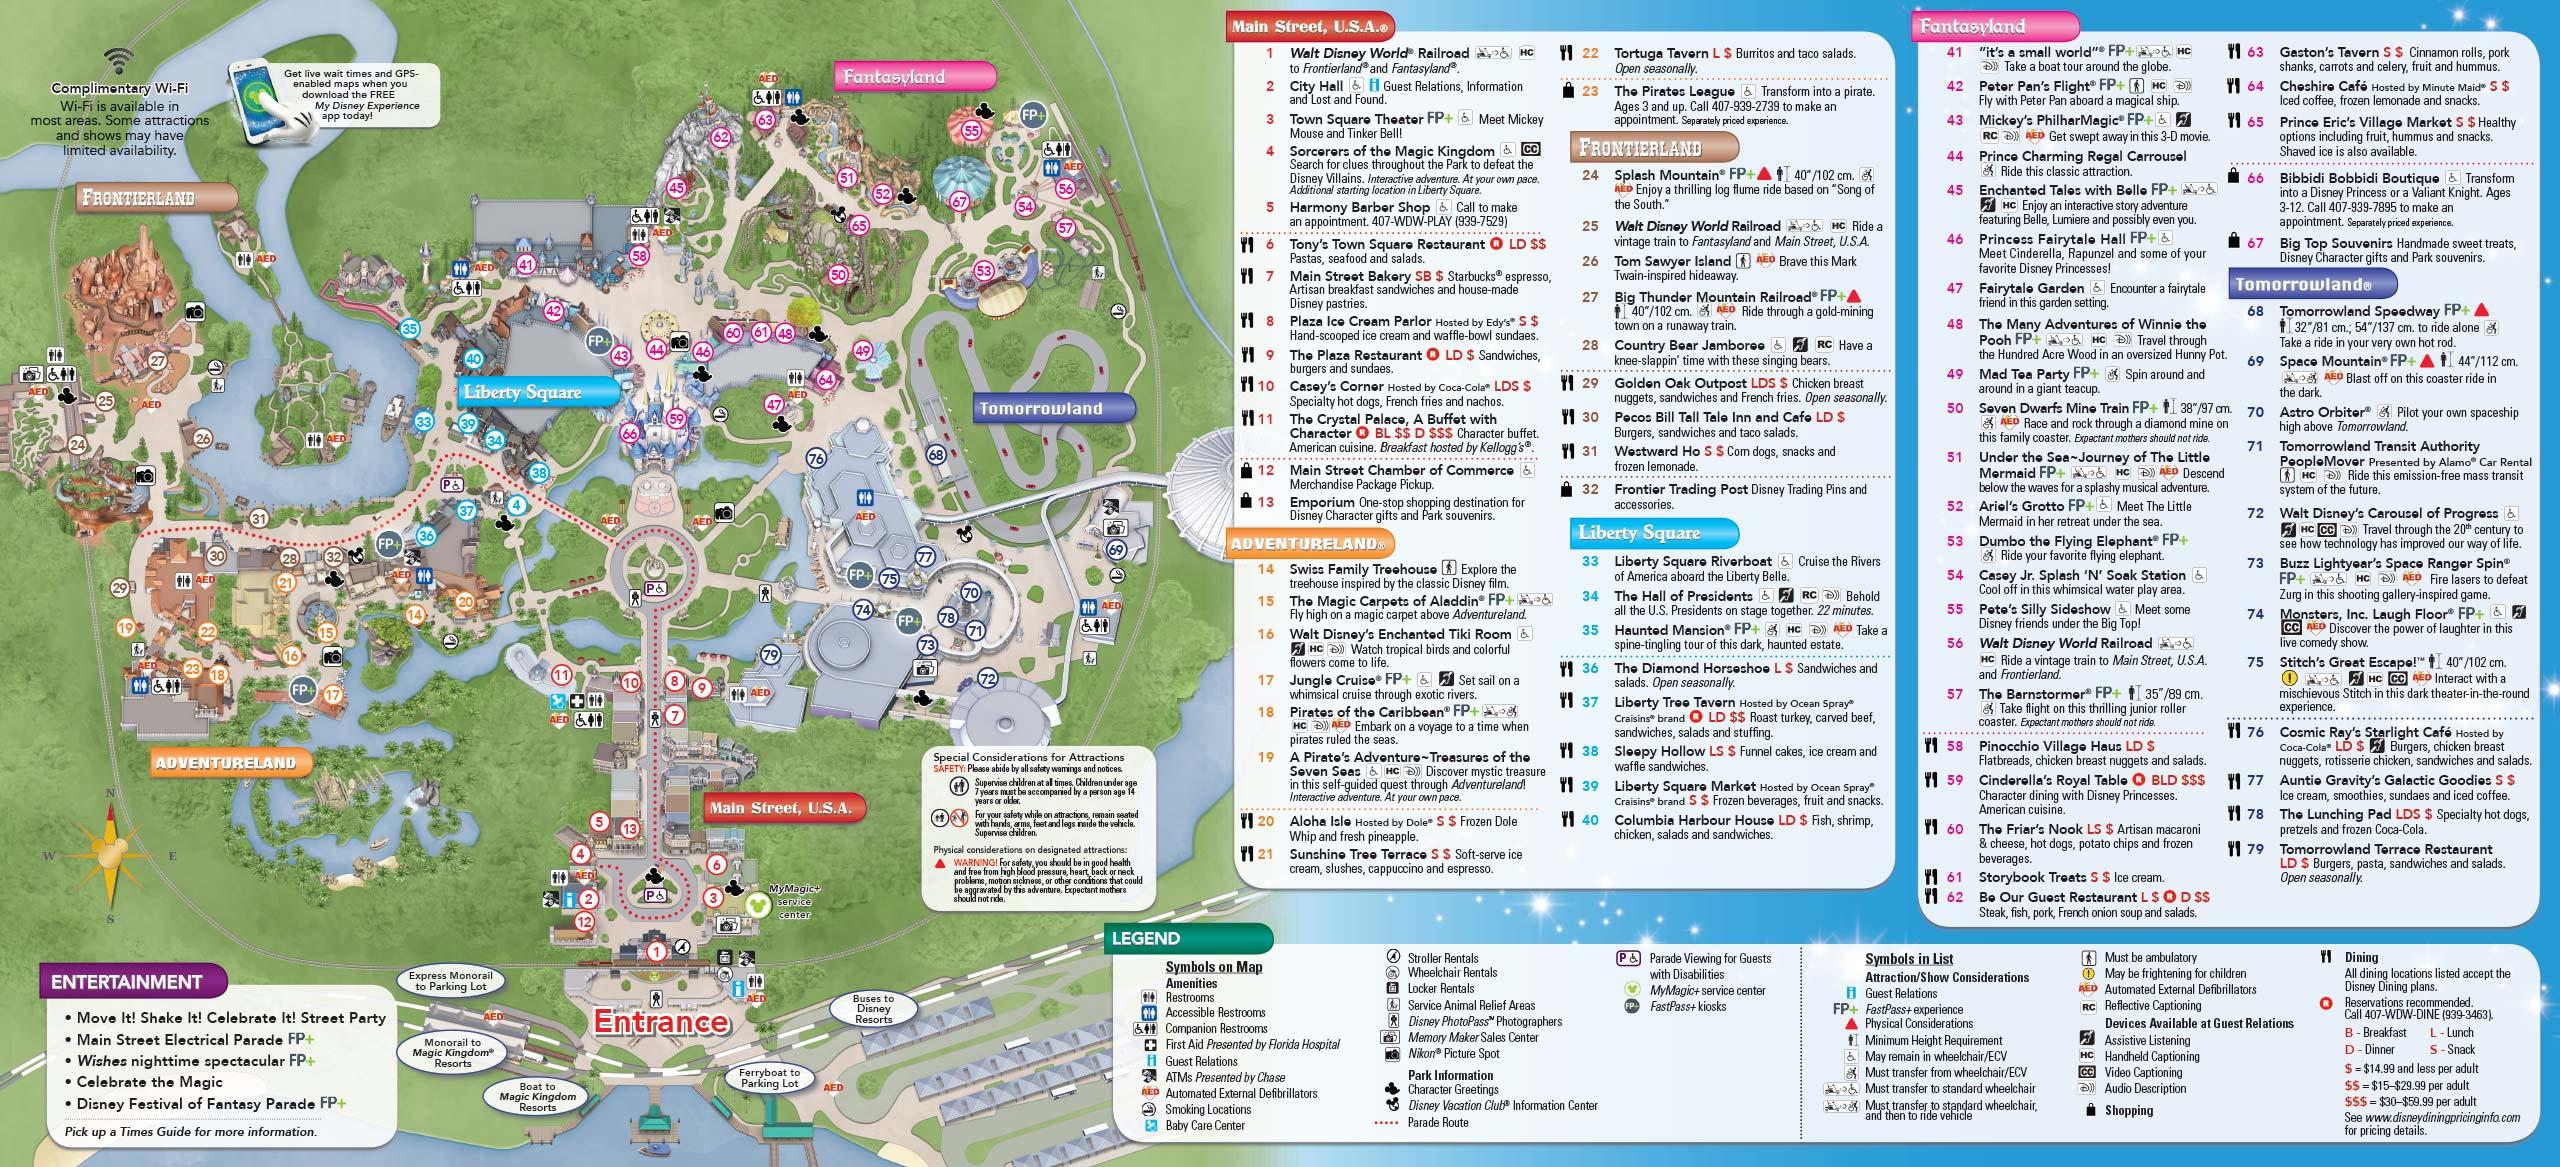 2014 Magic Kingdom Park Map